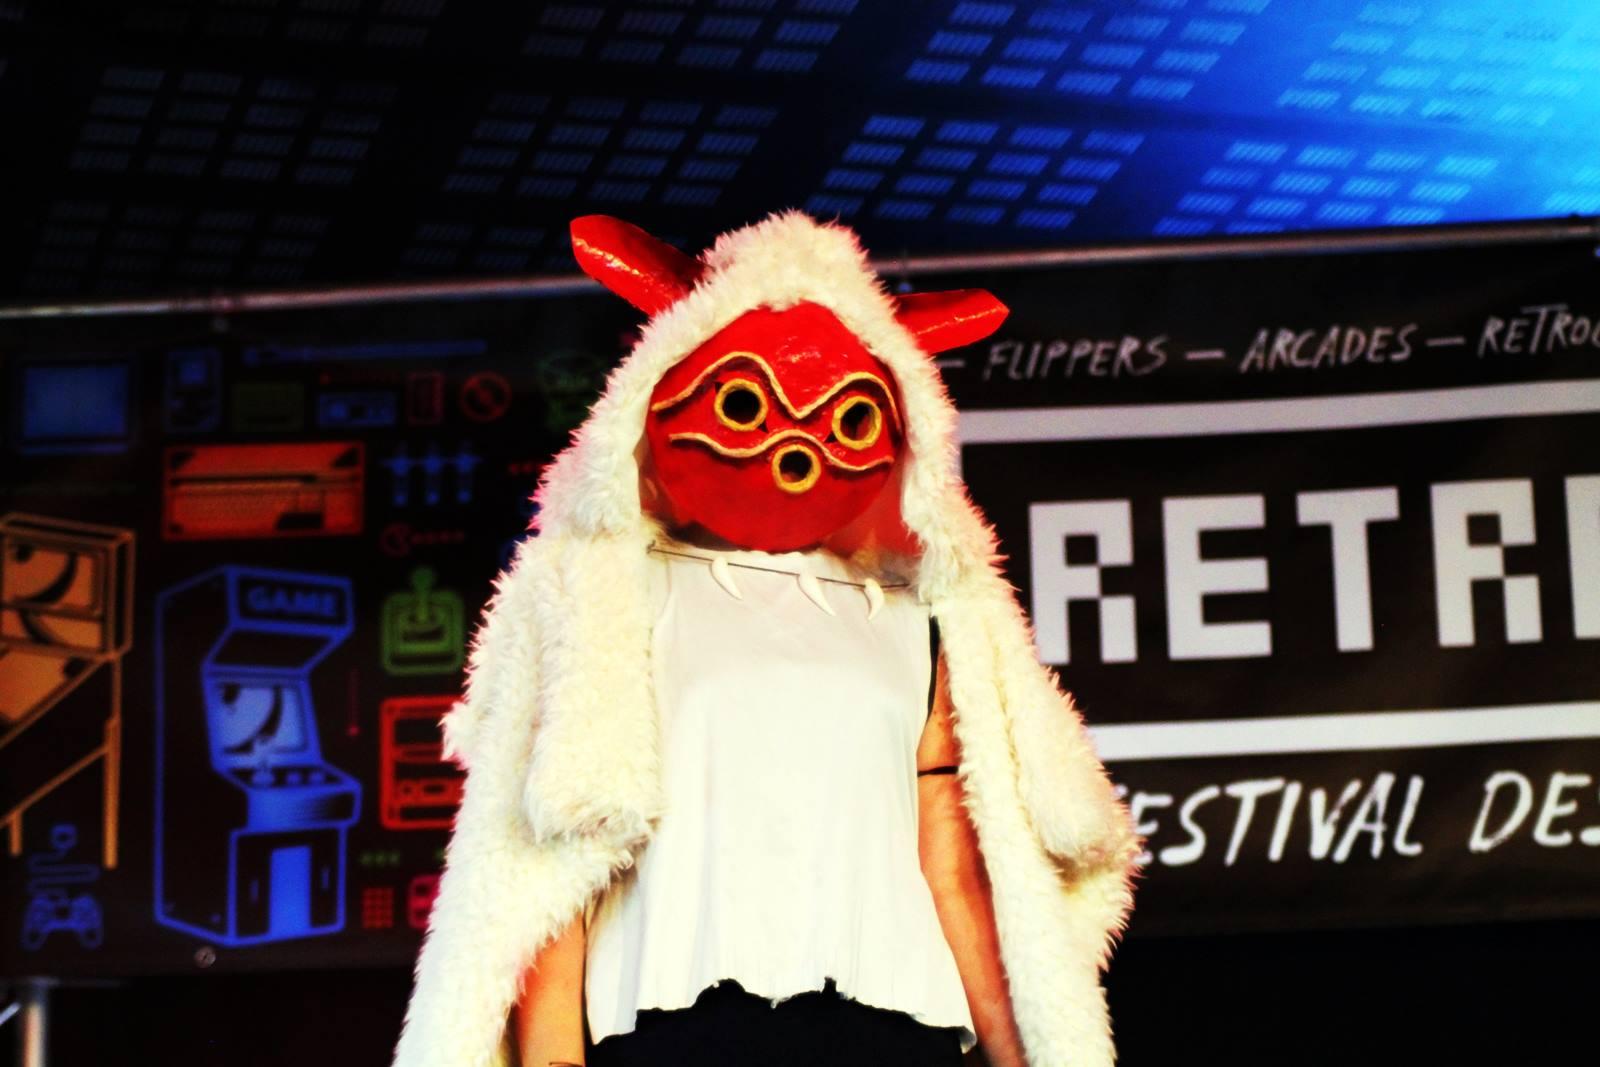 Festival retroplay convention loire atlantiquea17